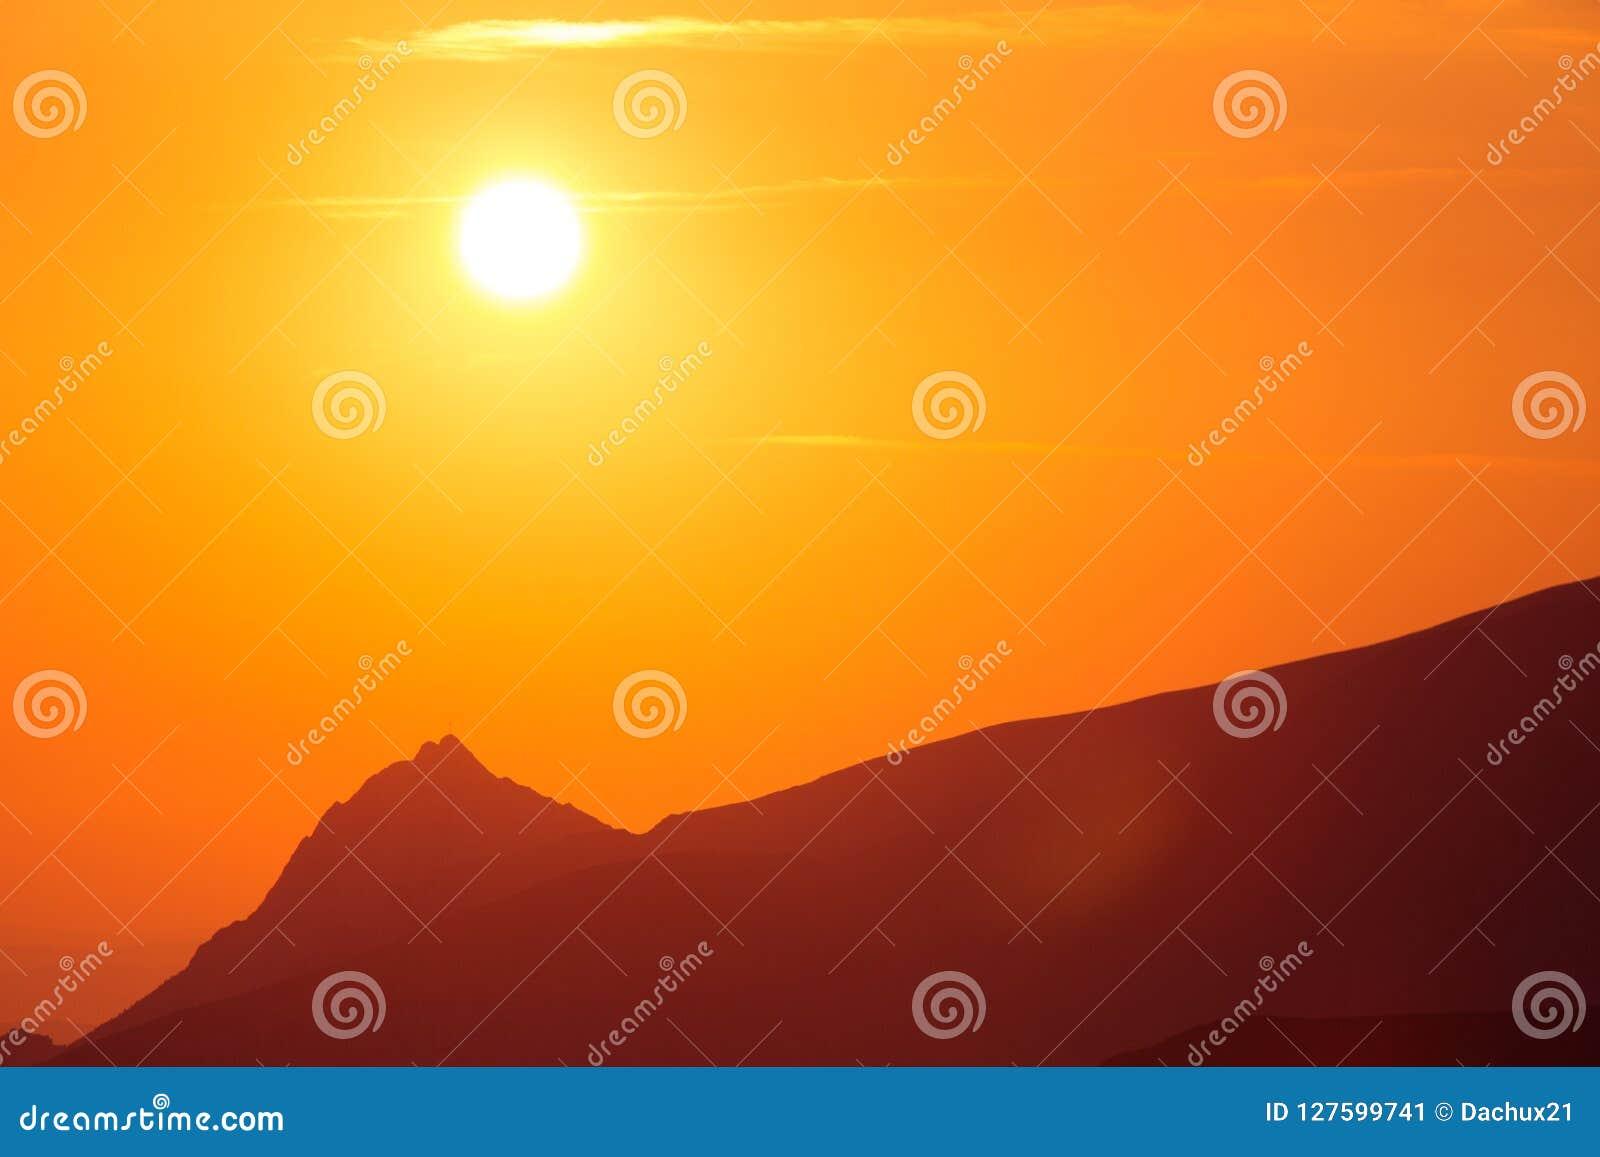 A Beautiful Minimalist Landscape During The Sunrise Over